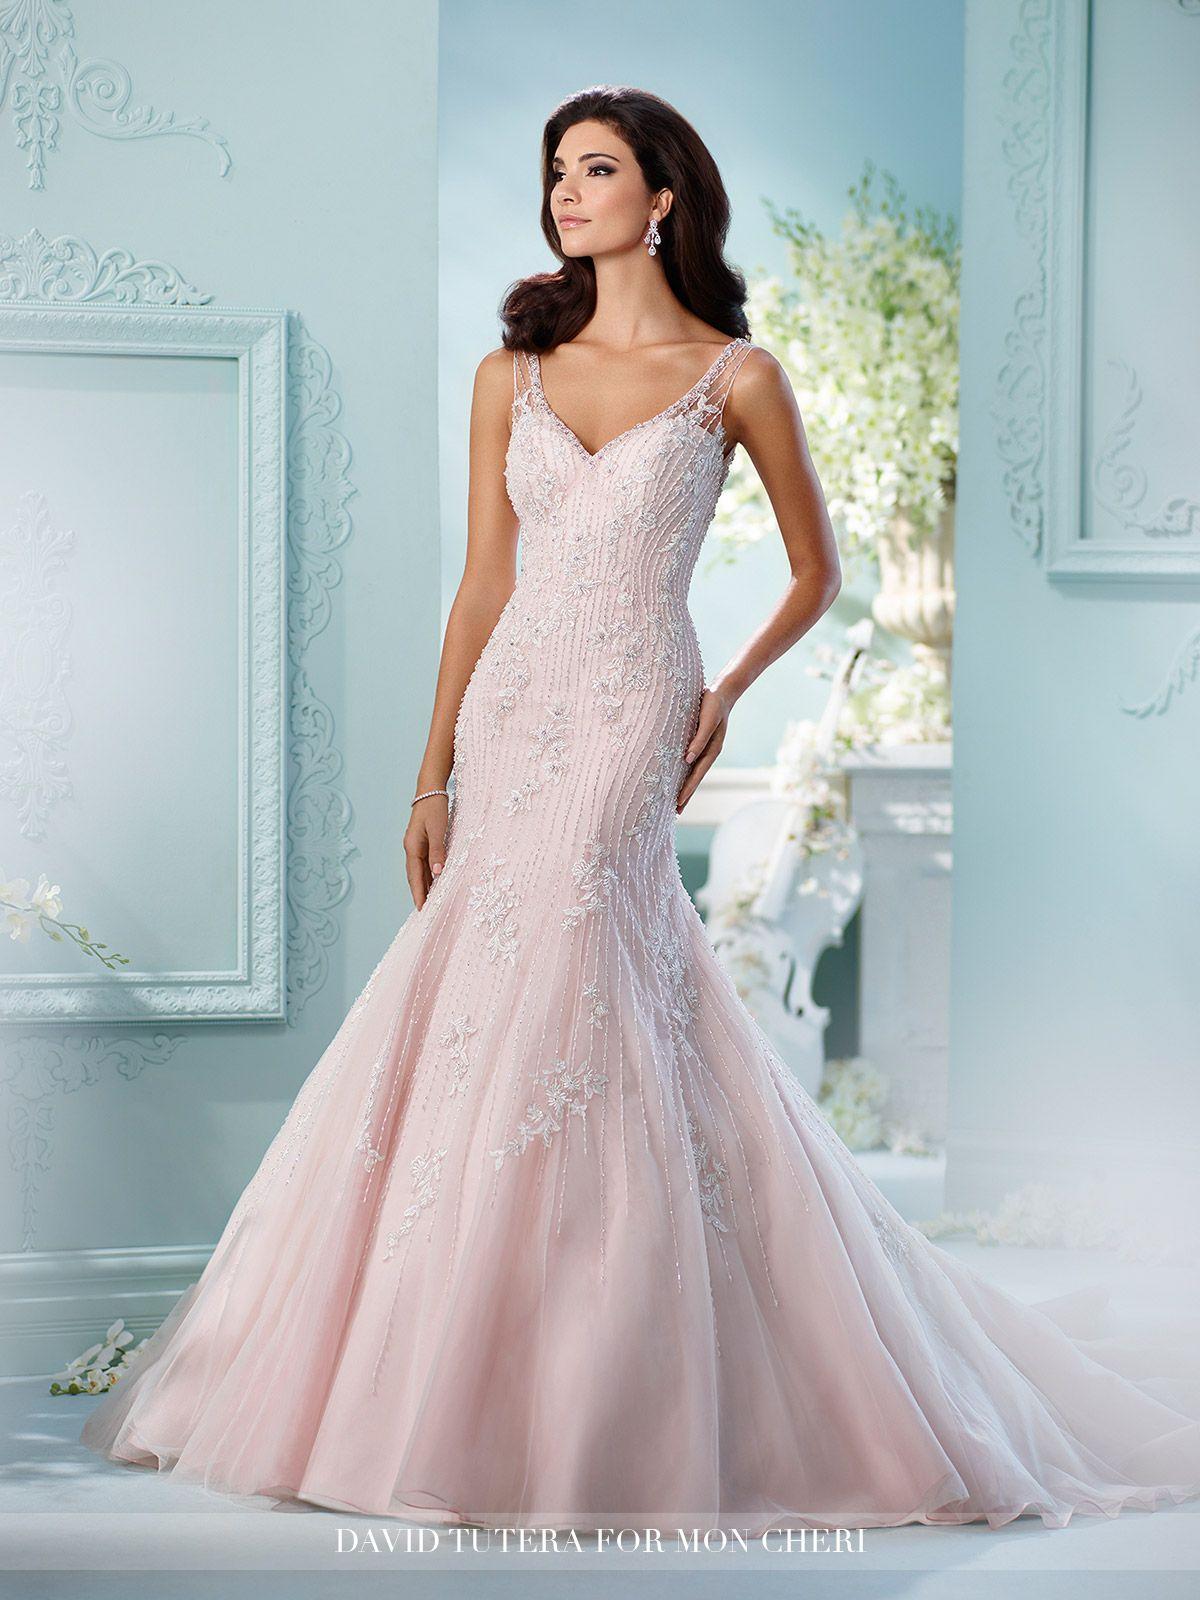 Pink and Blush Wedding Dresses | Blush wedding dresses, Blush ...